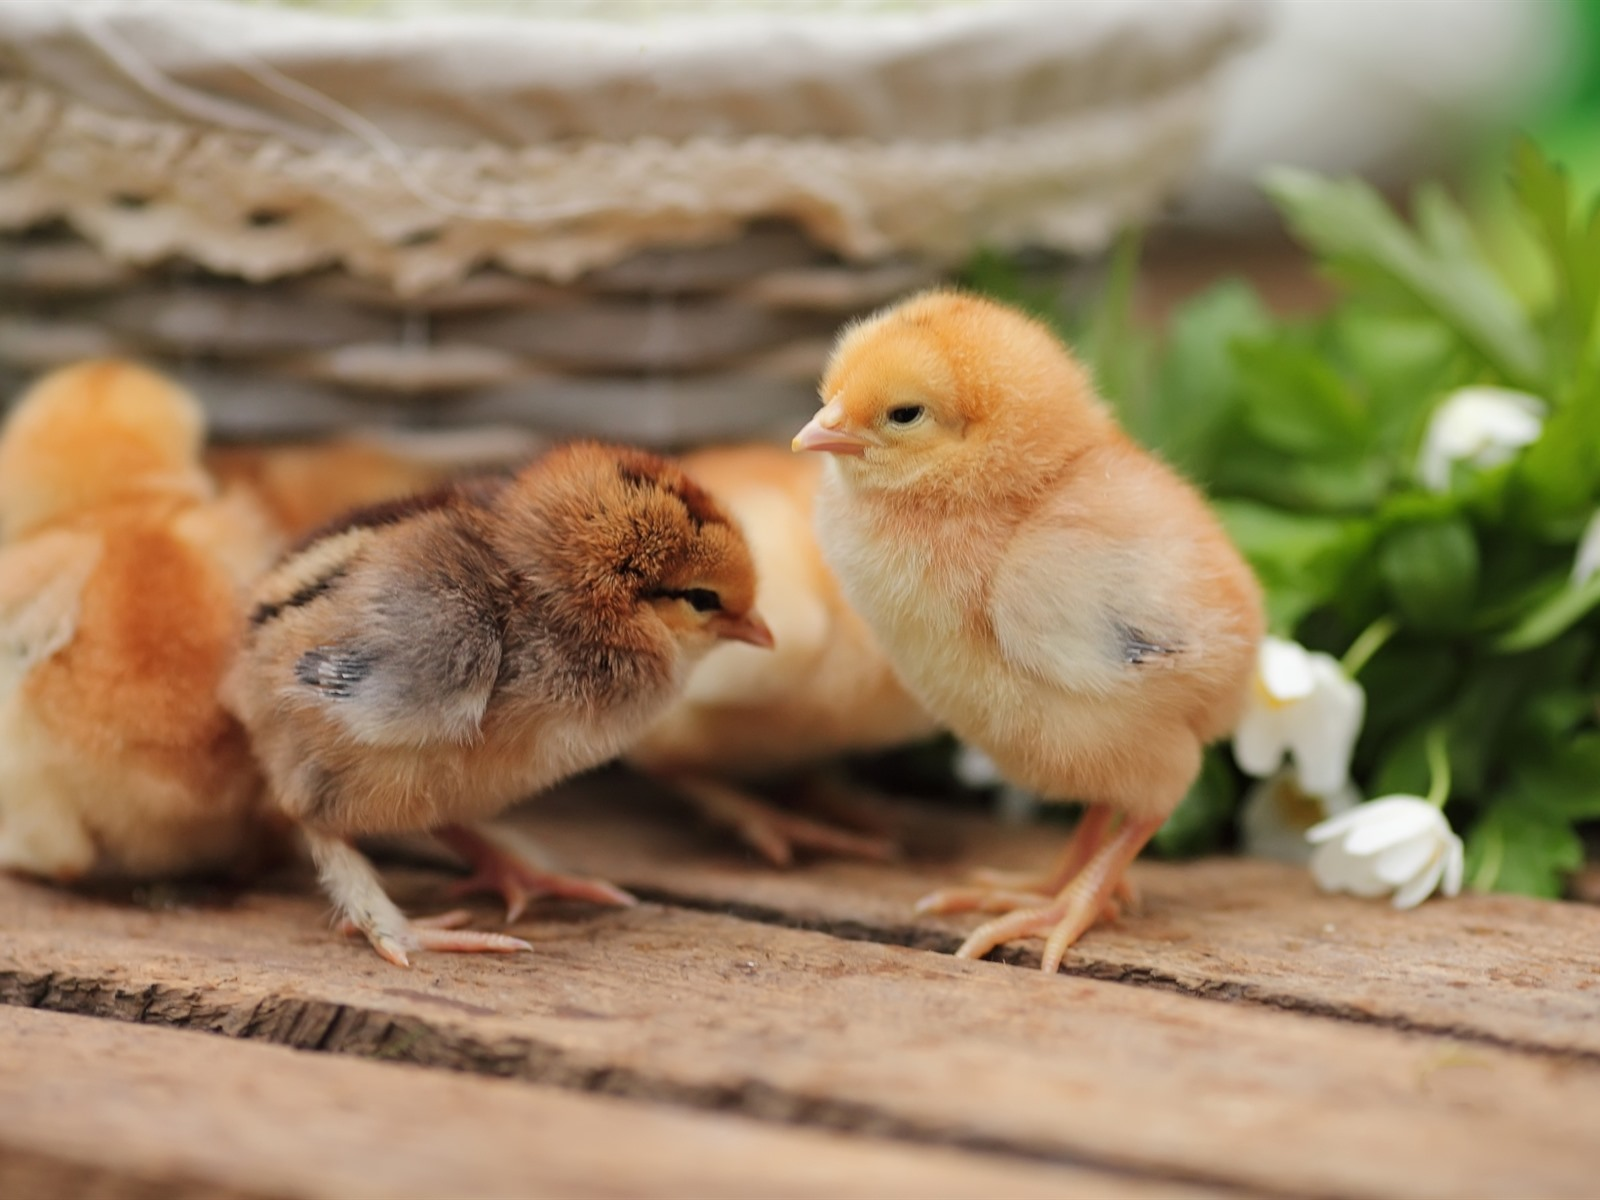 Cute Chickens 640x1136 IPhone 5/5S/5C/SE Wallpaper